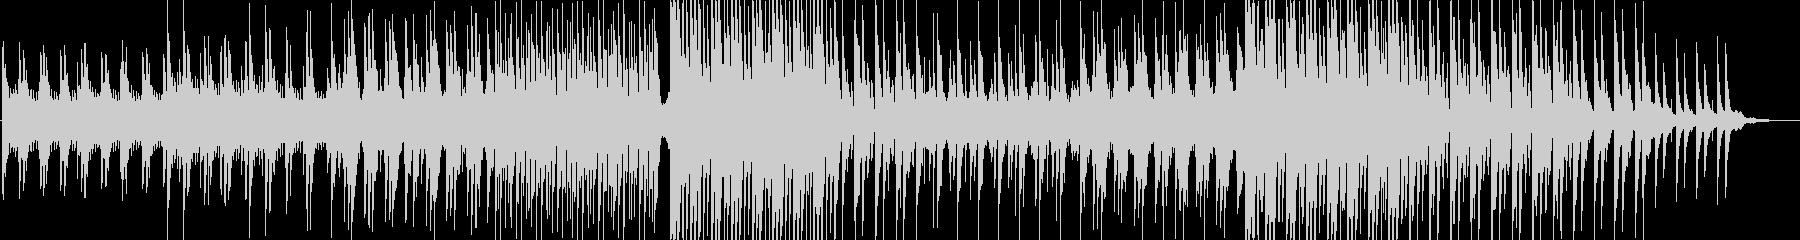 PV-畑-森-自然-四季-動物-雫-雄大の未再生の波形